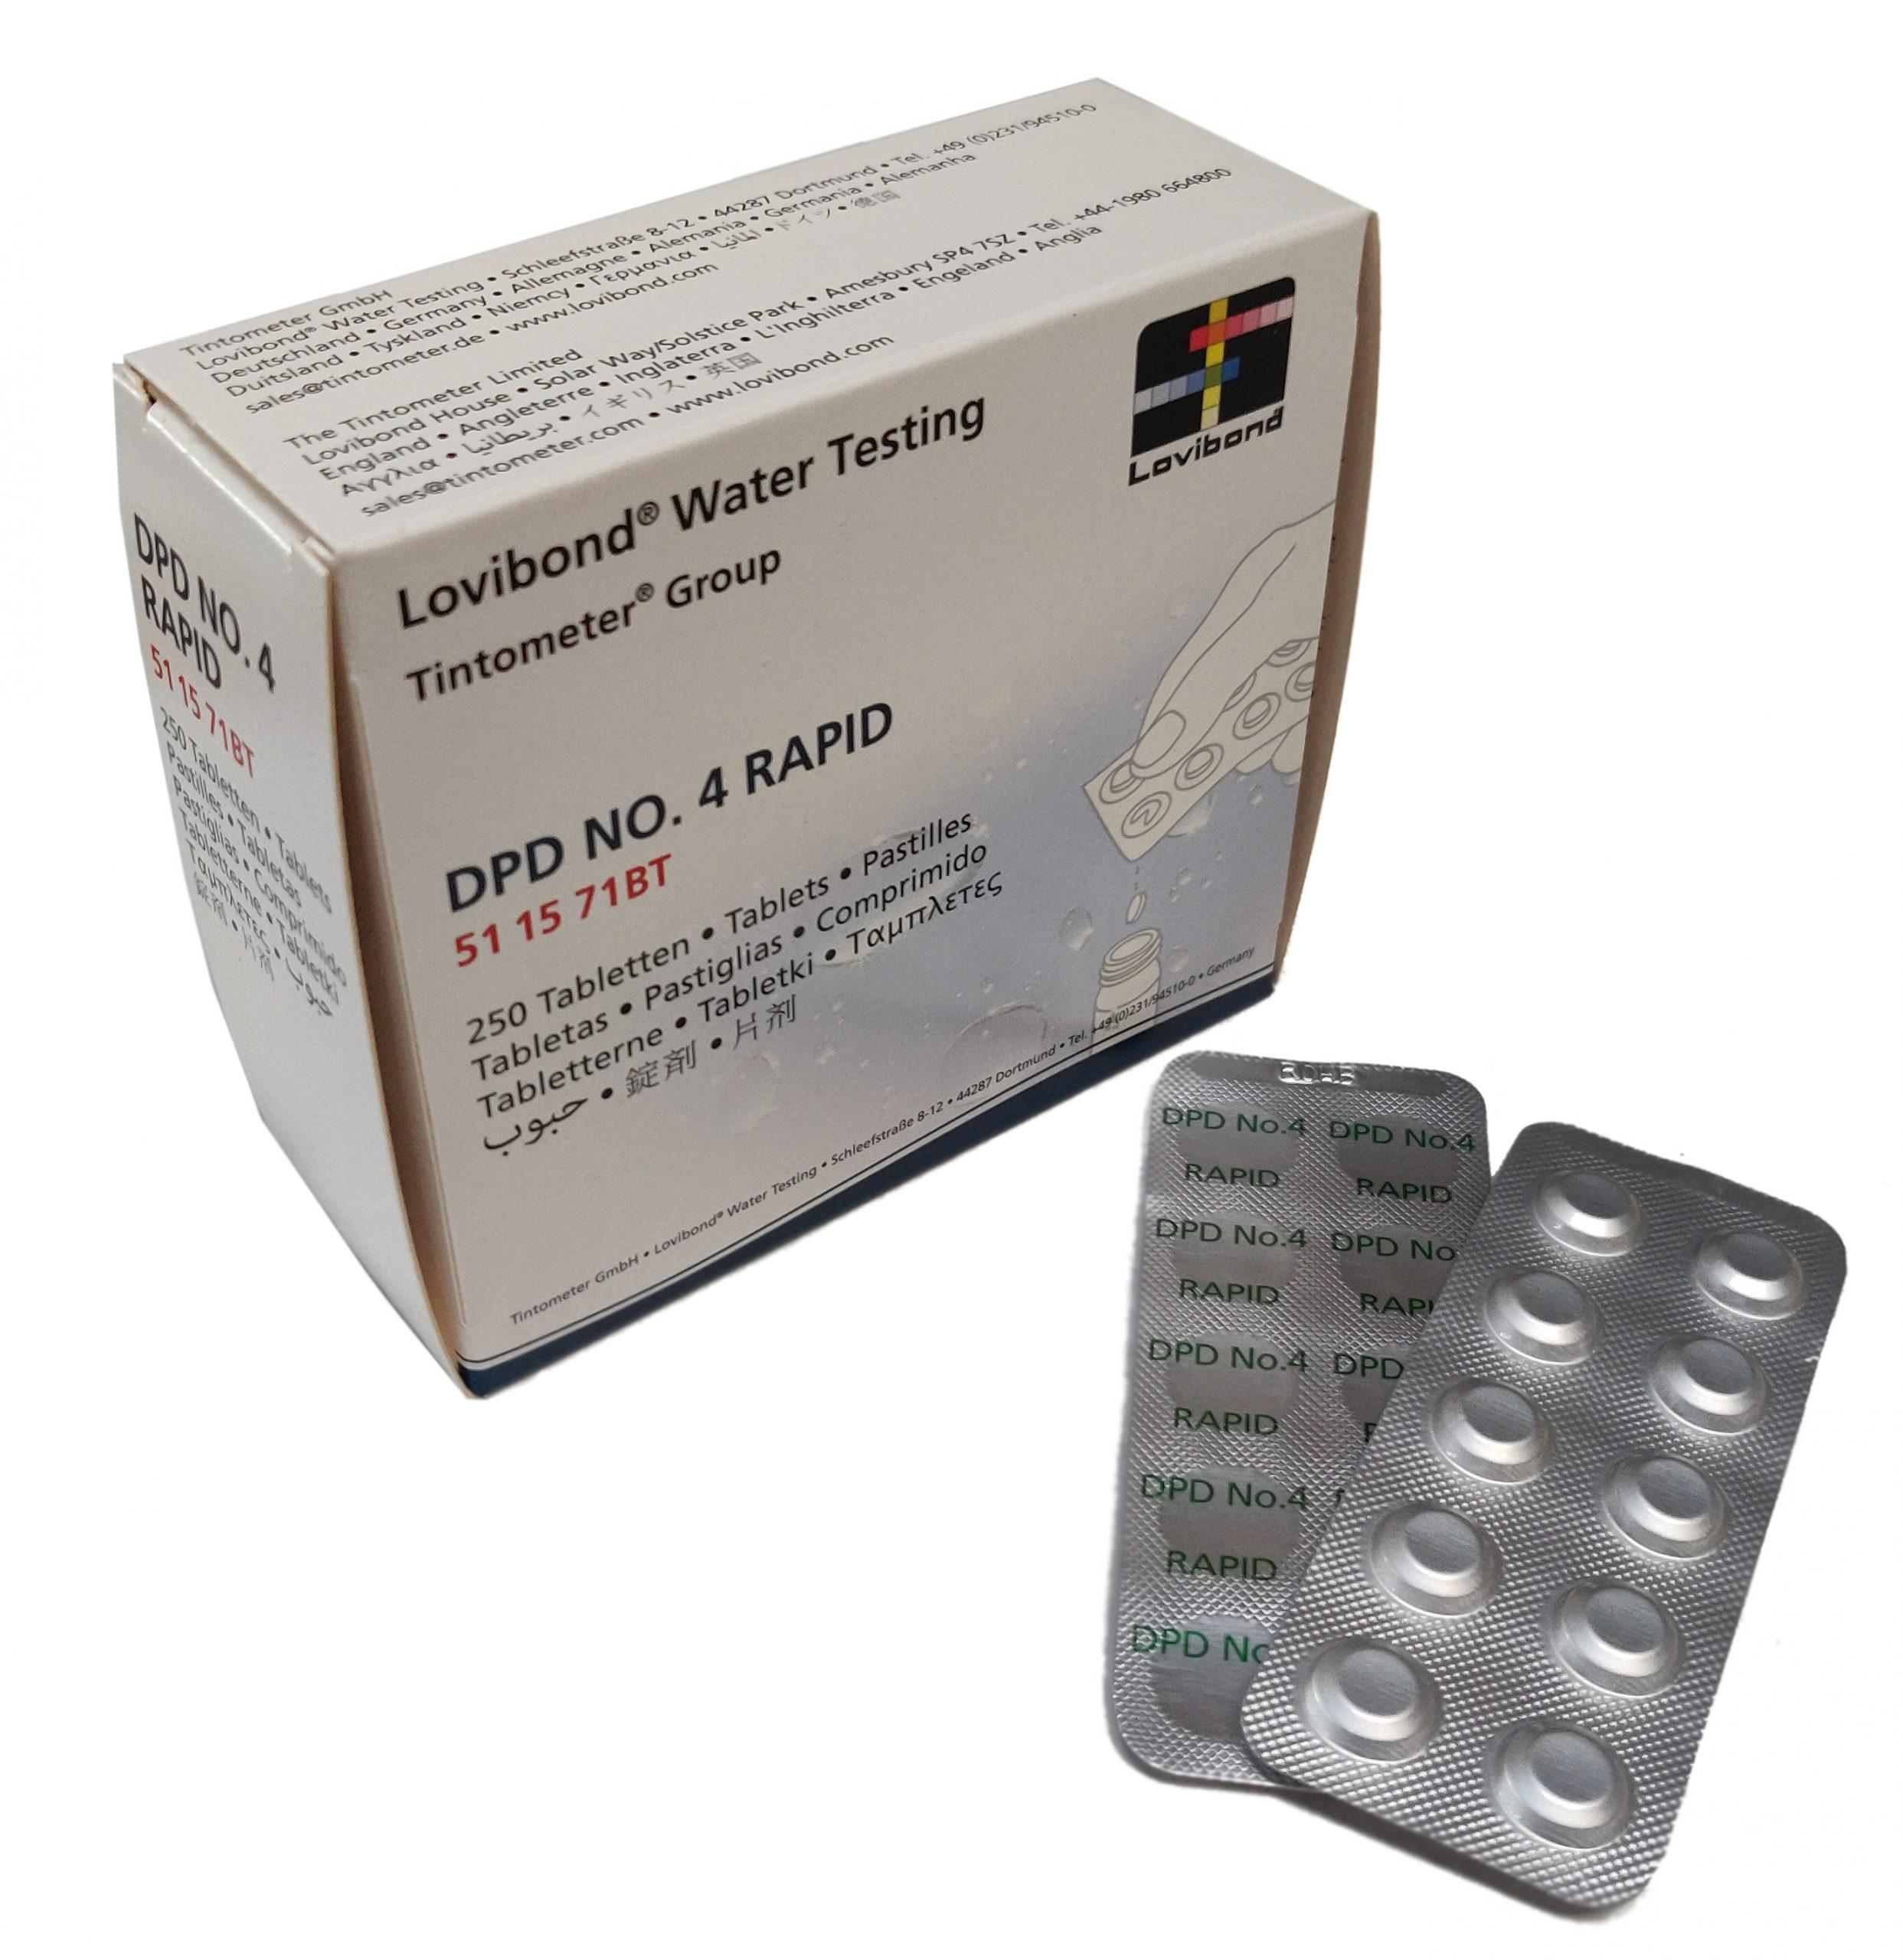 DPD nr. 4 Rapid Aktiv Oxygen (håndryster)